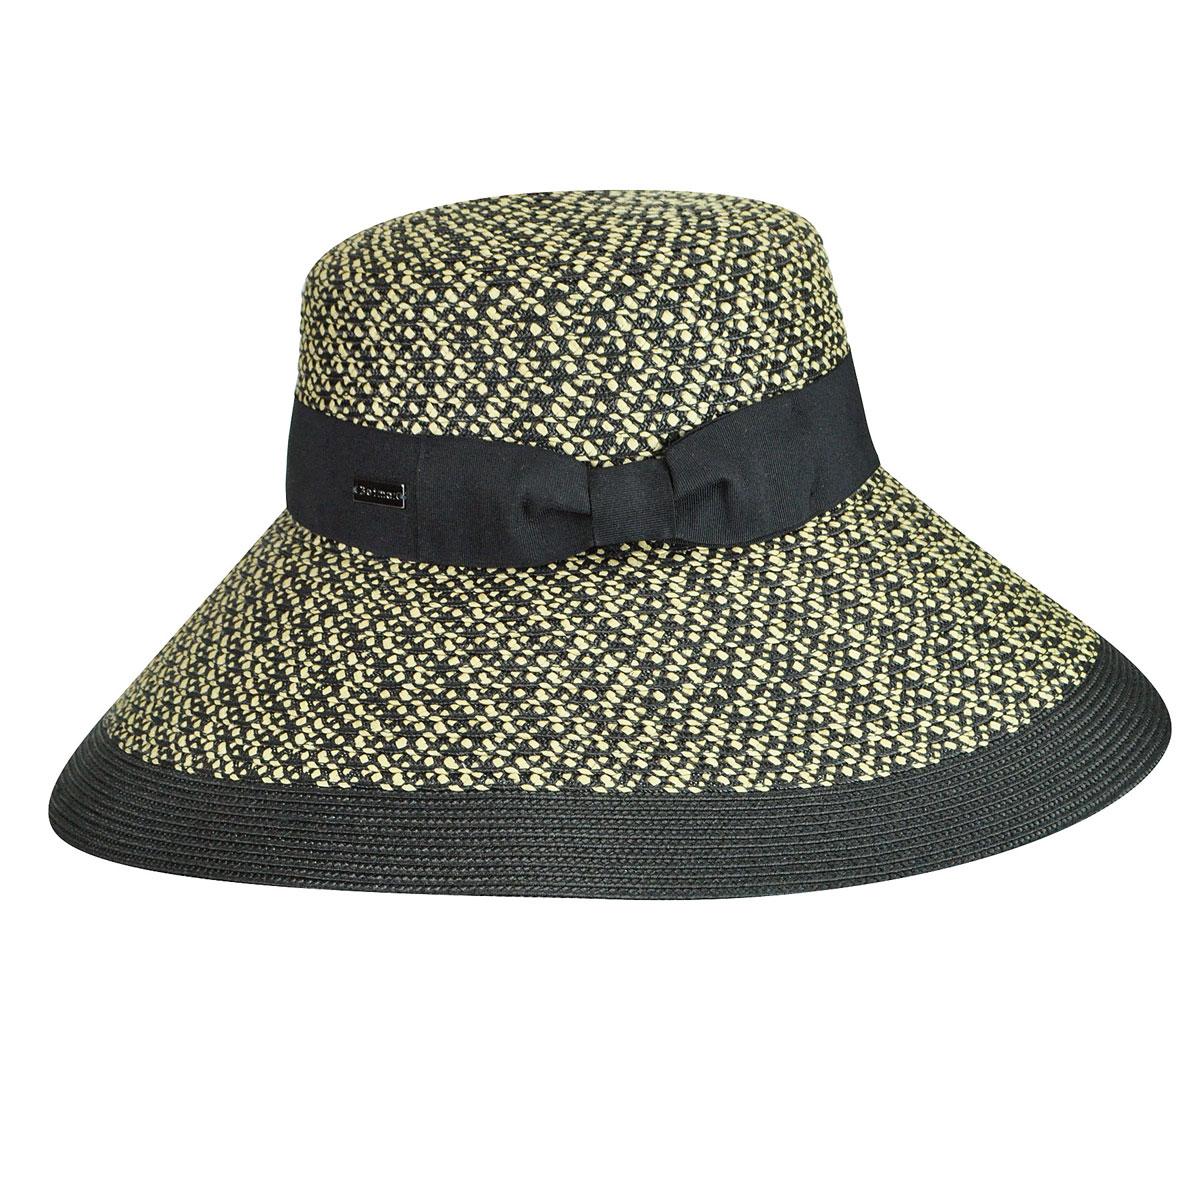 Betmar Audrey Braided Wide Brim Hat in Natural,Black